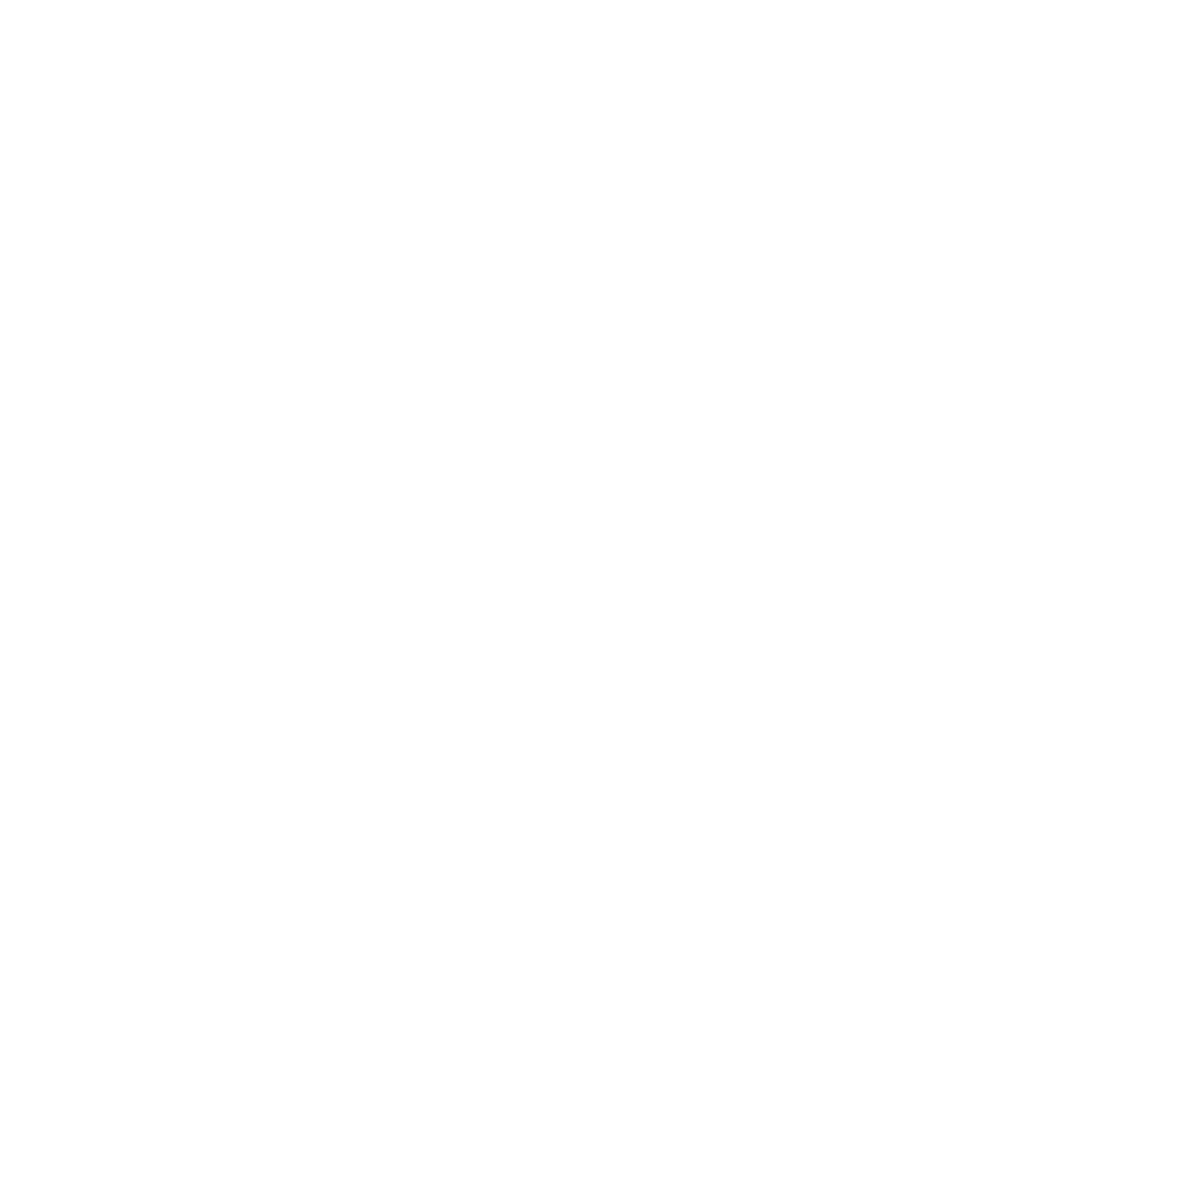 Sevierville church of Christ